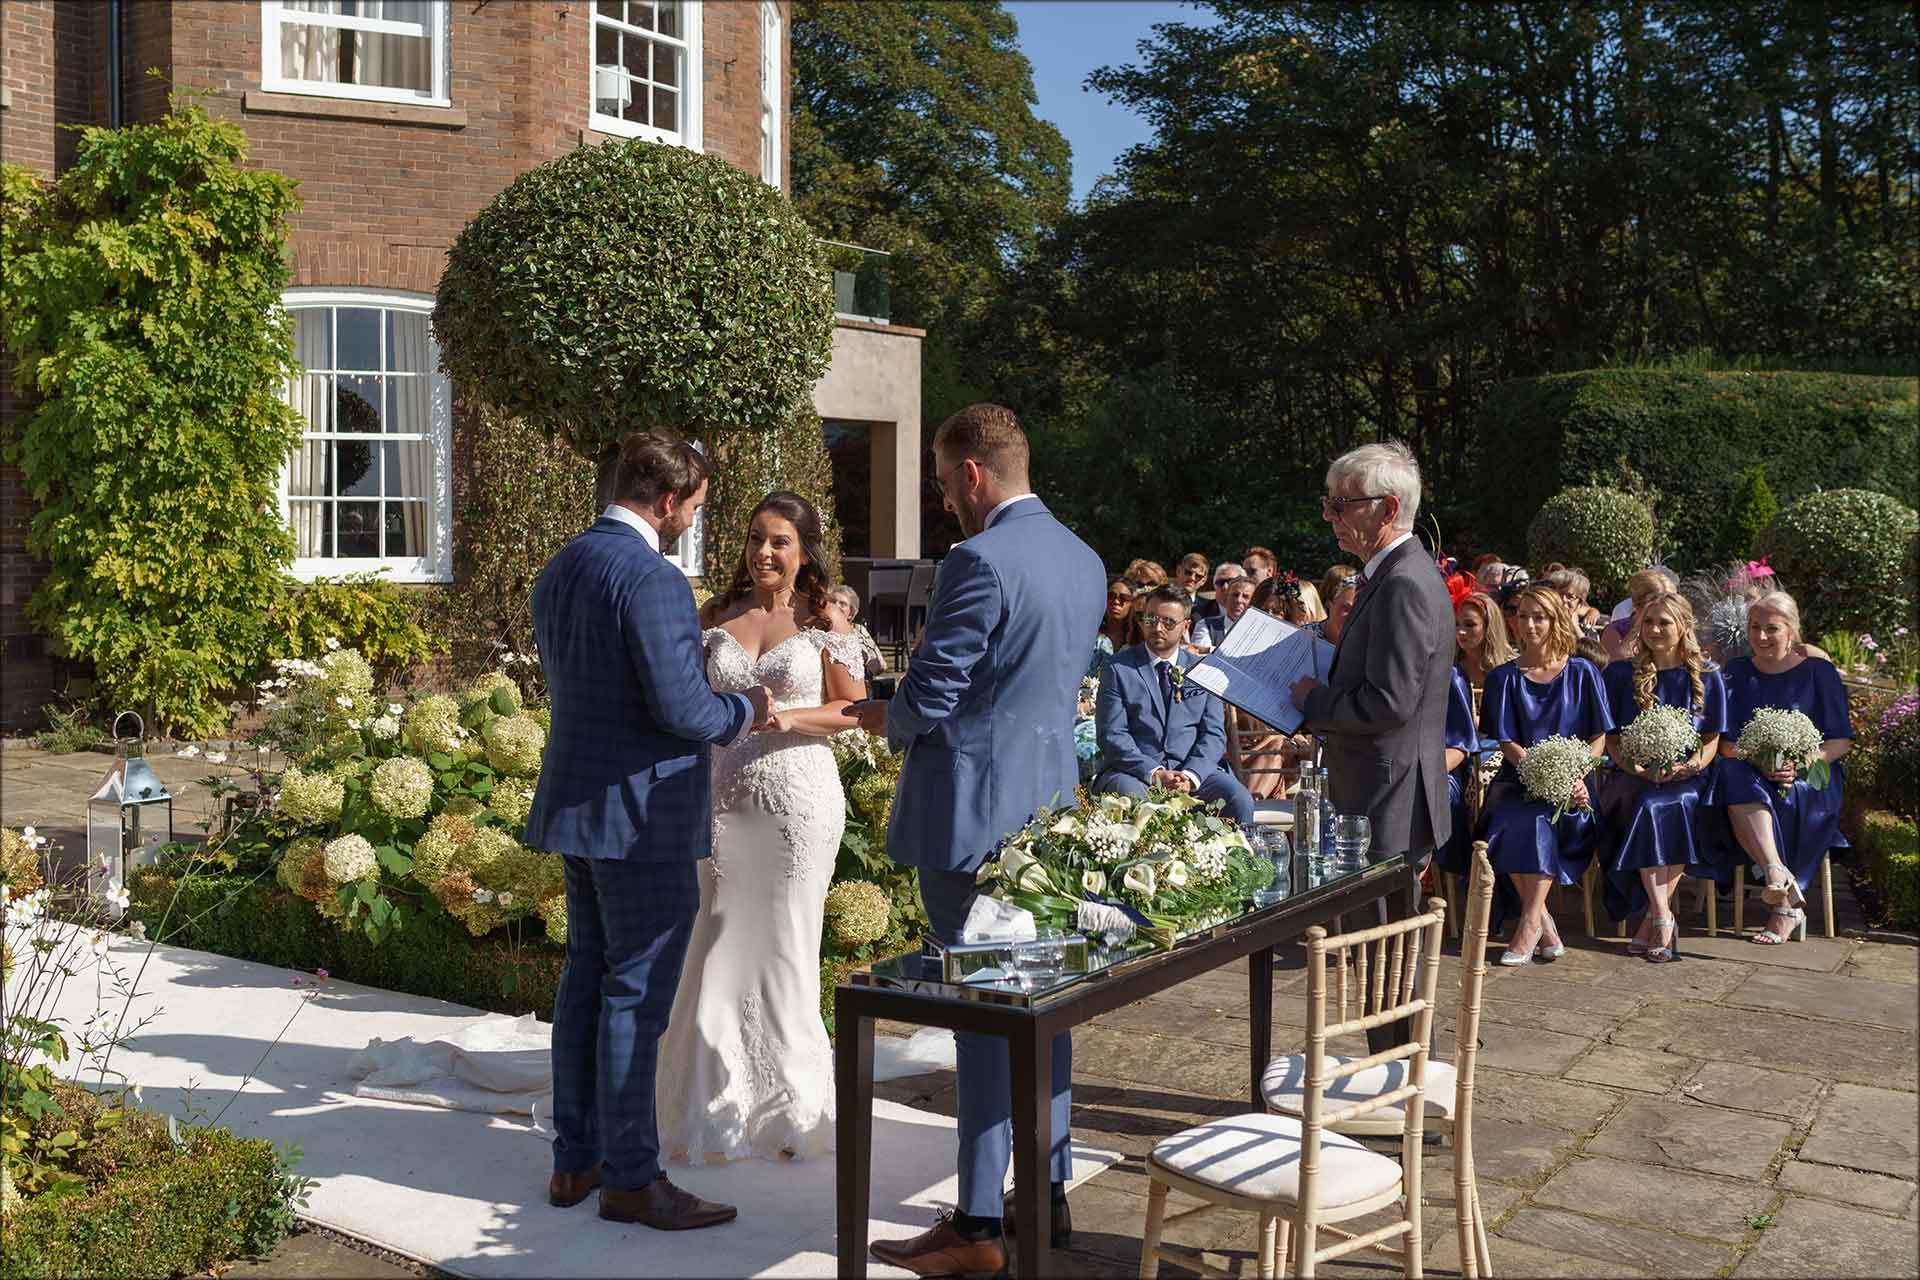 Outdoor exchanging wedding rings